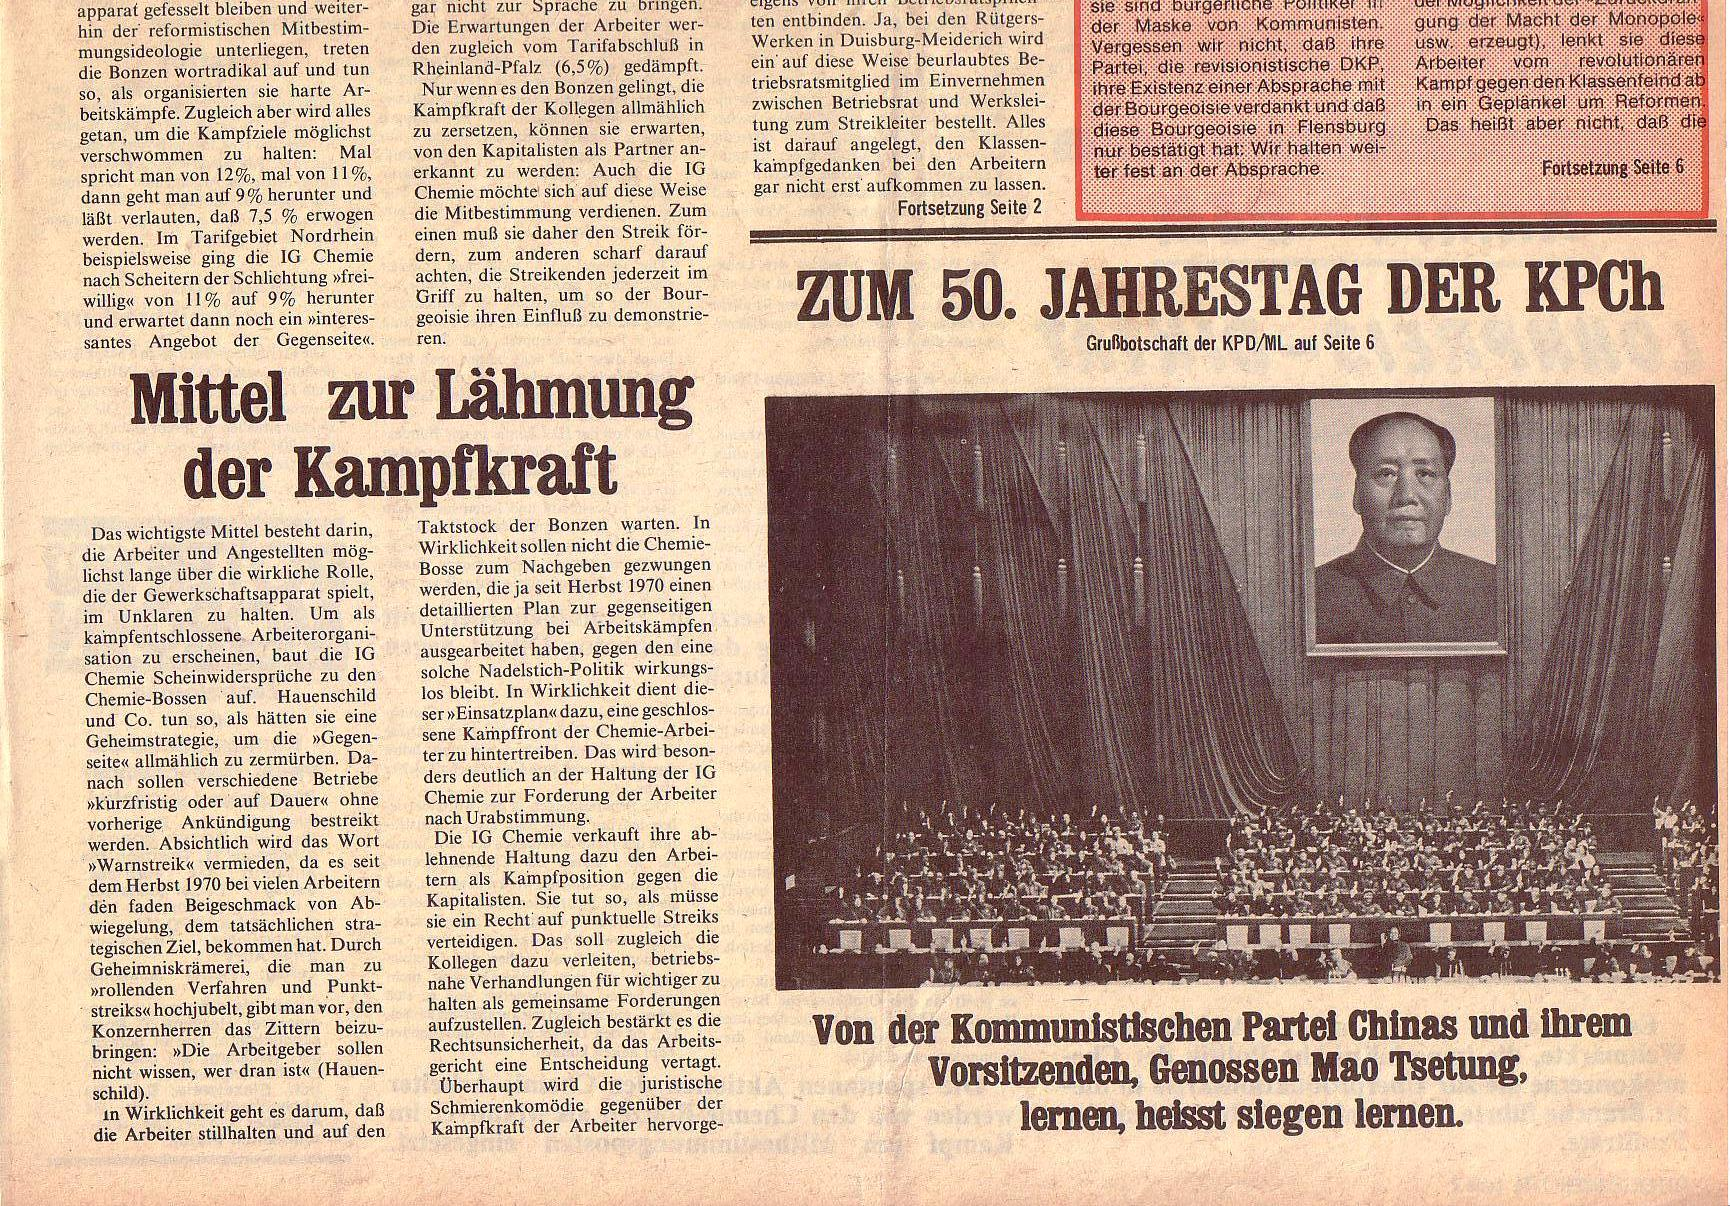 Roter Morgen, 5. Jg., Juli 1971, Nr. 7, Seite 1b